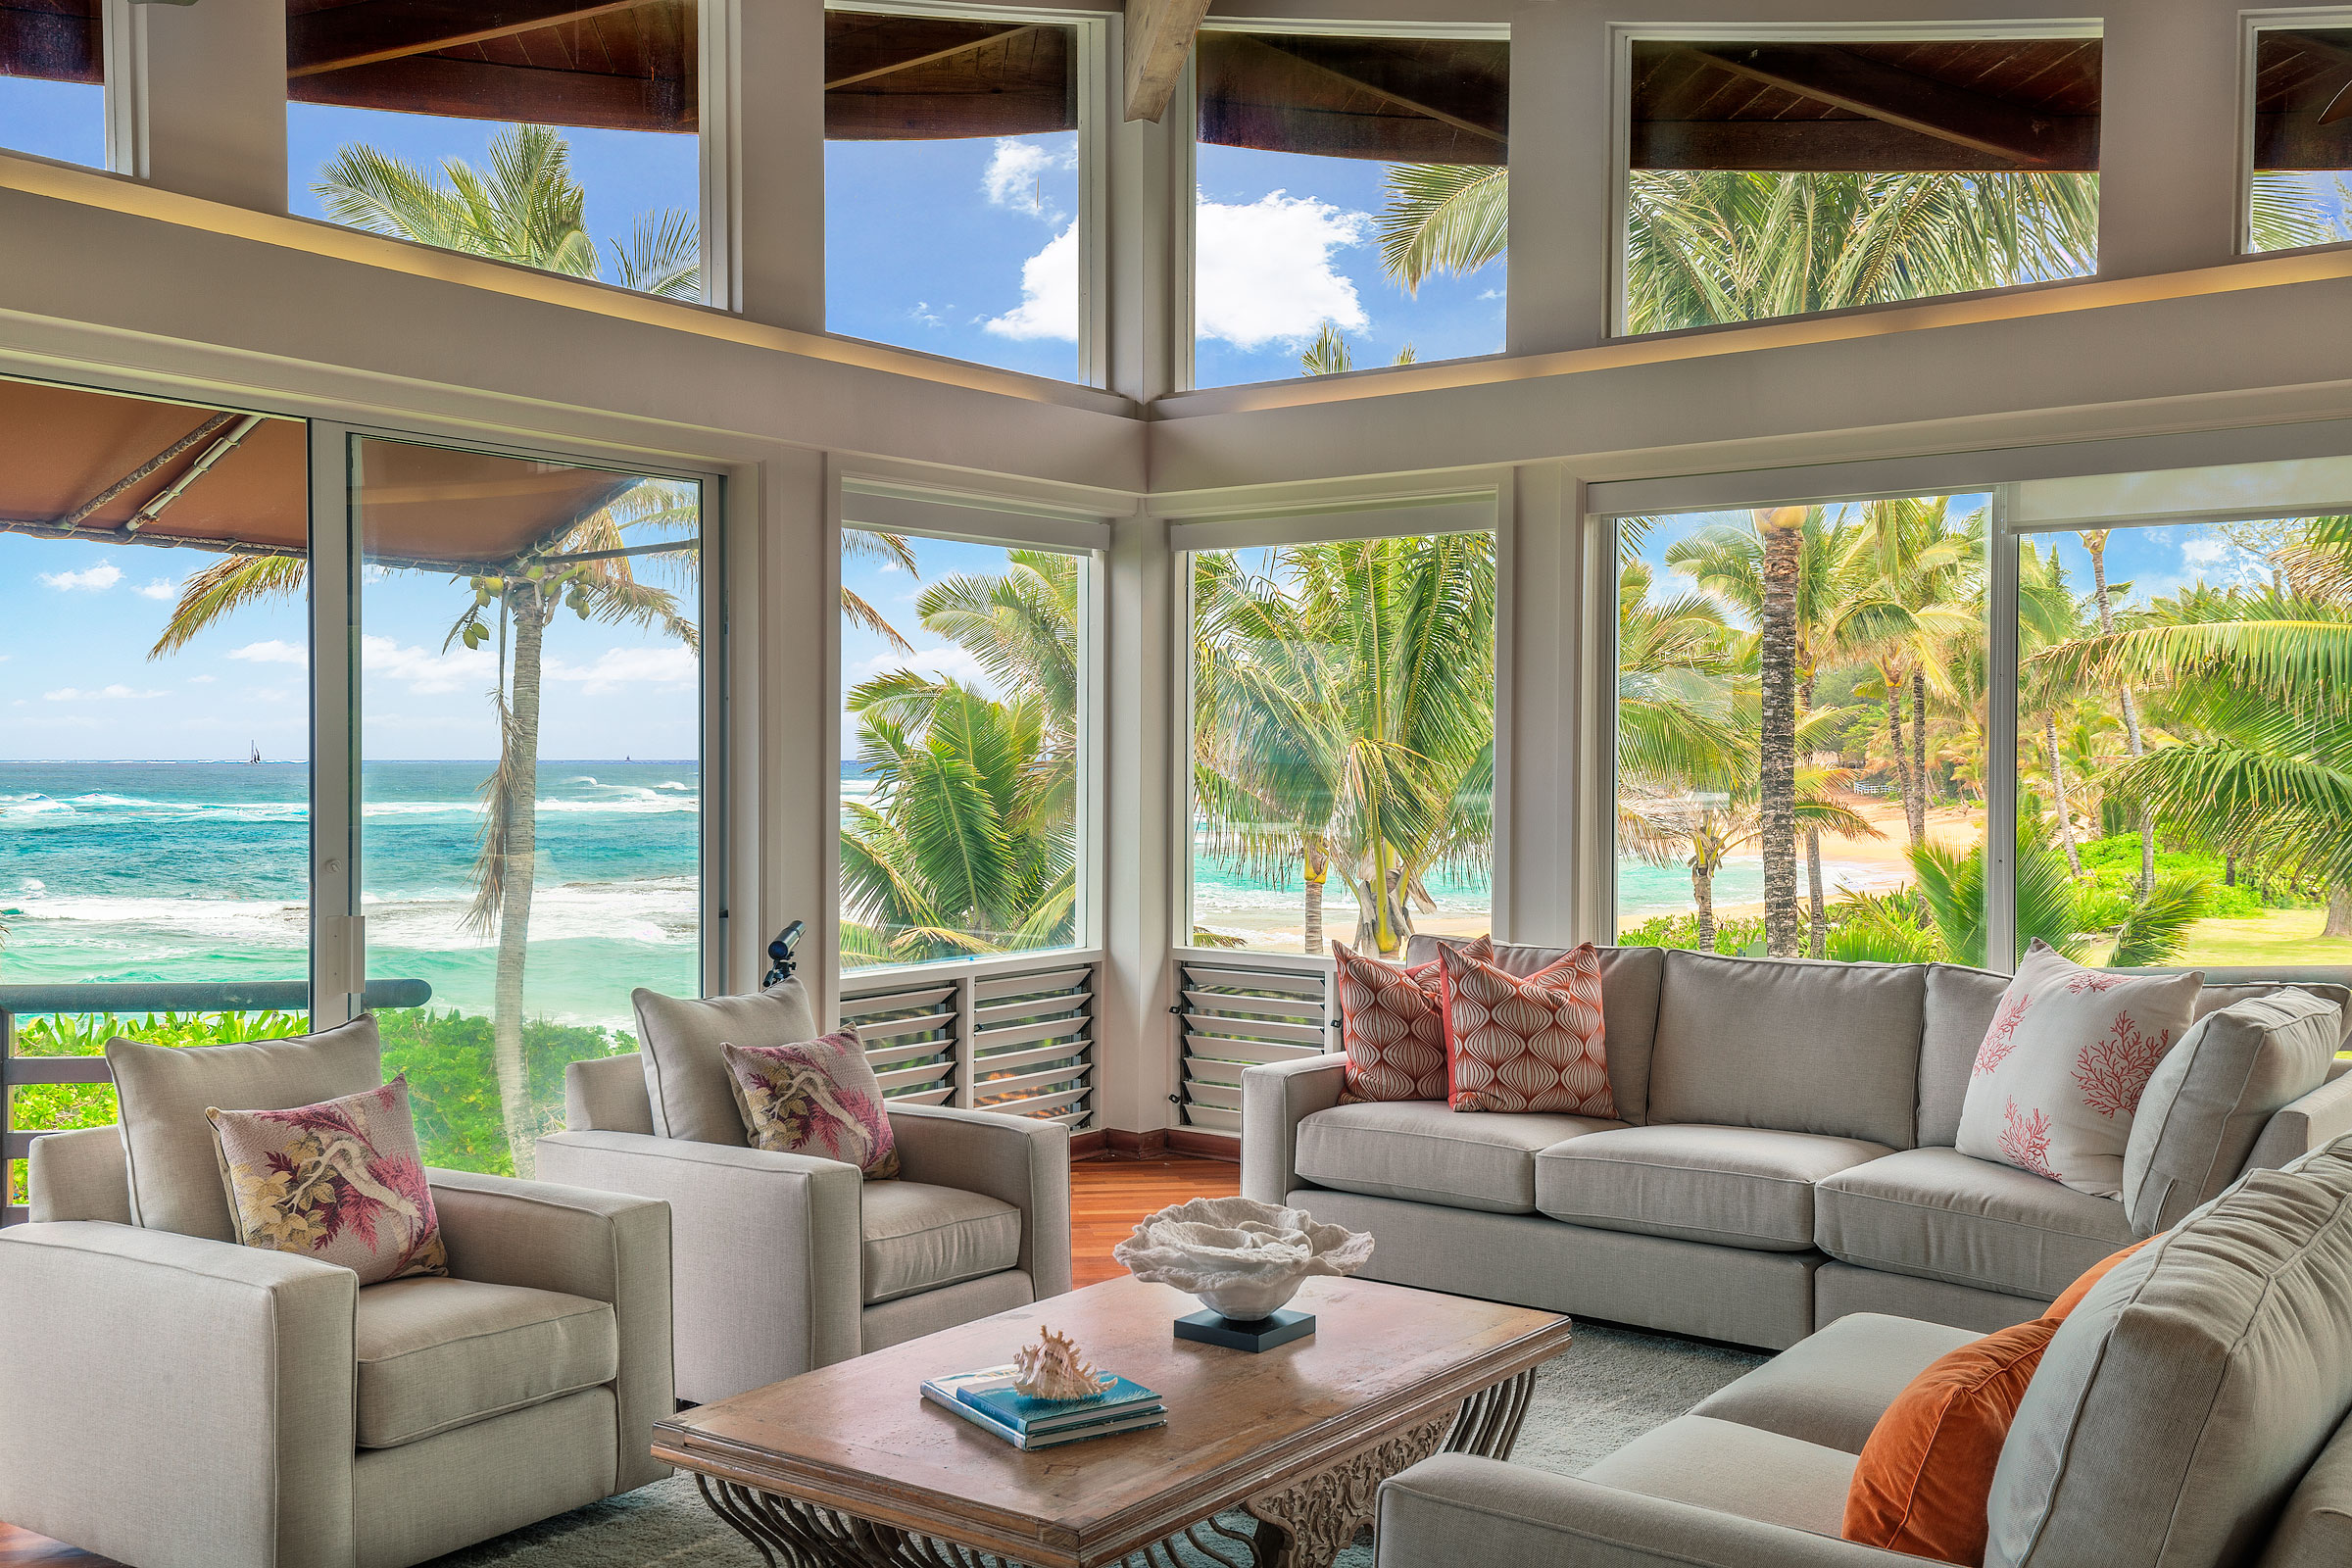 Kauai Luxury Home Photos